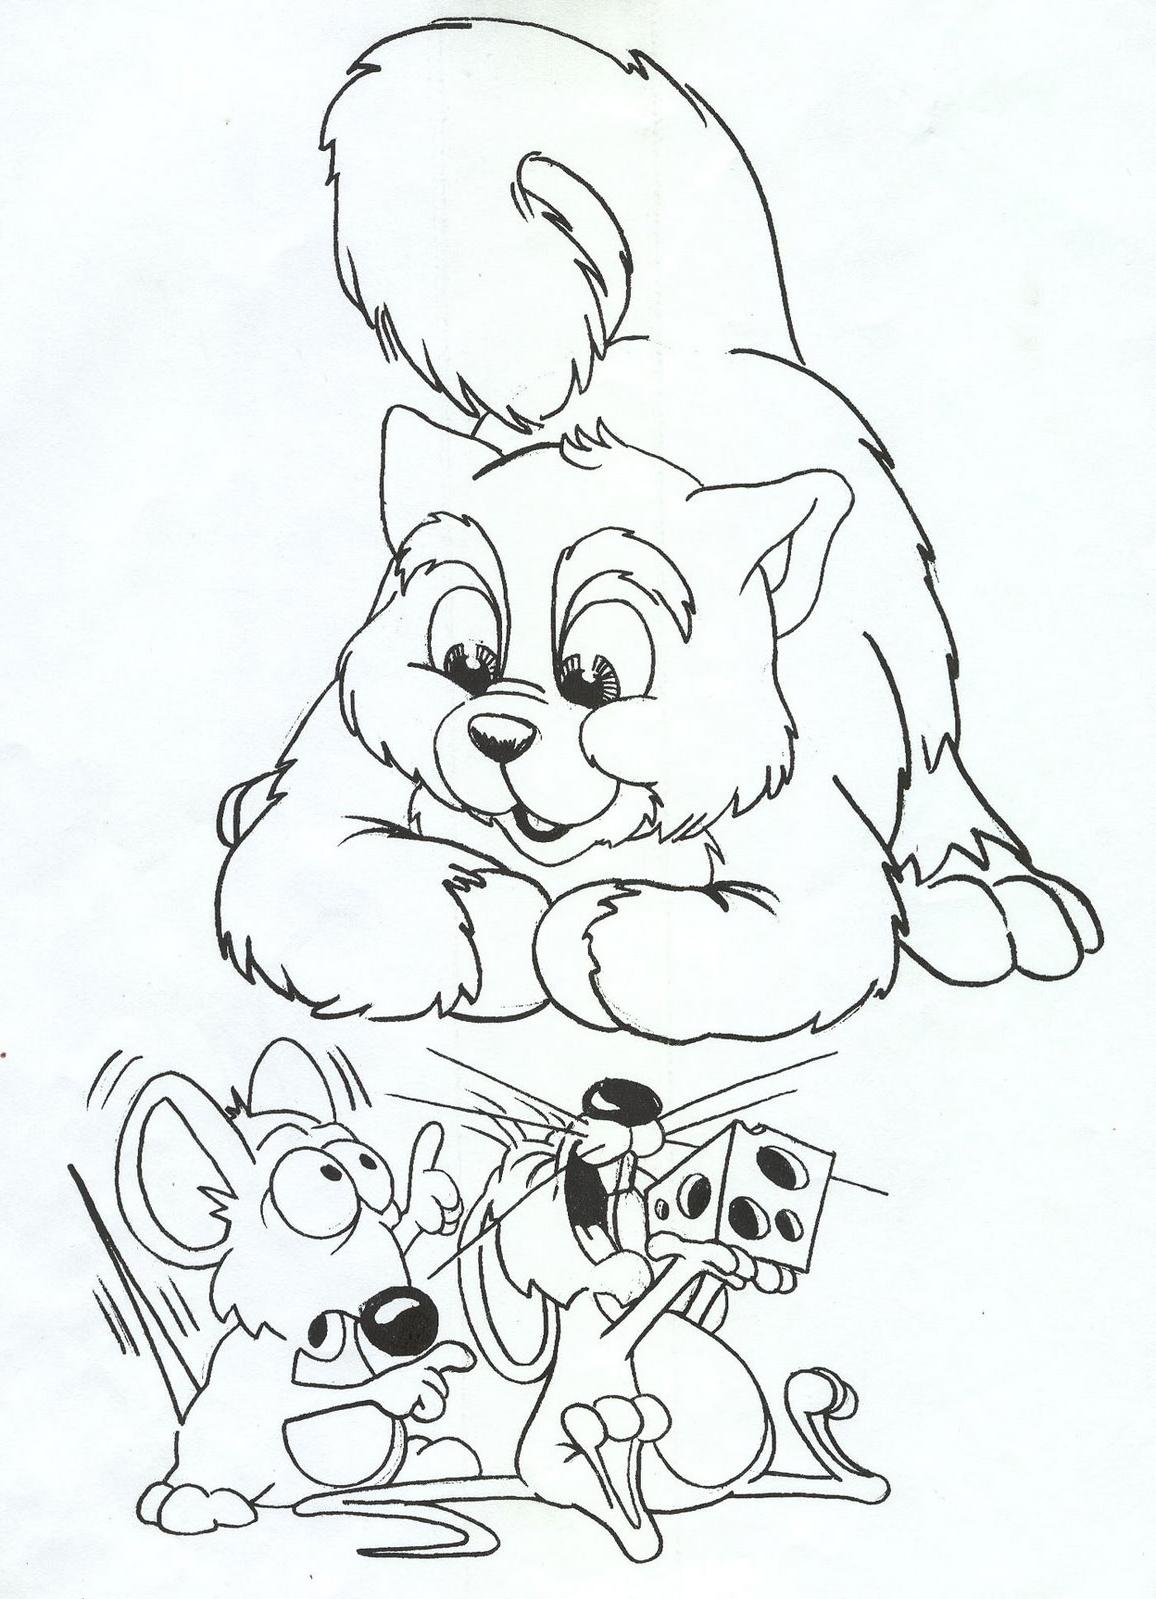 Bath rabbits Archives - Two Bad Mice | Bunny art, Nursery ... | 1599x1156